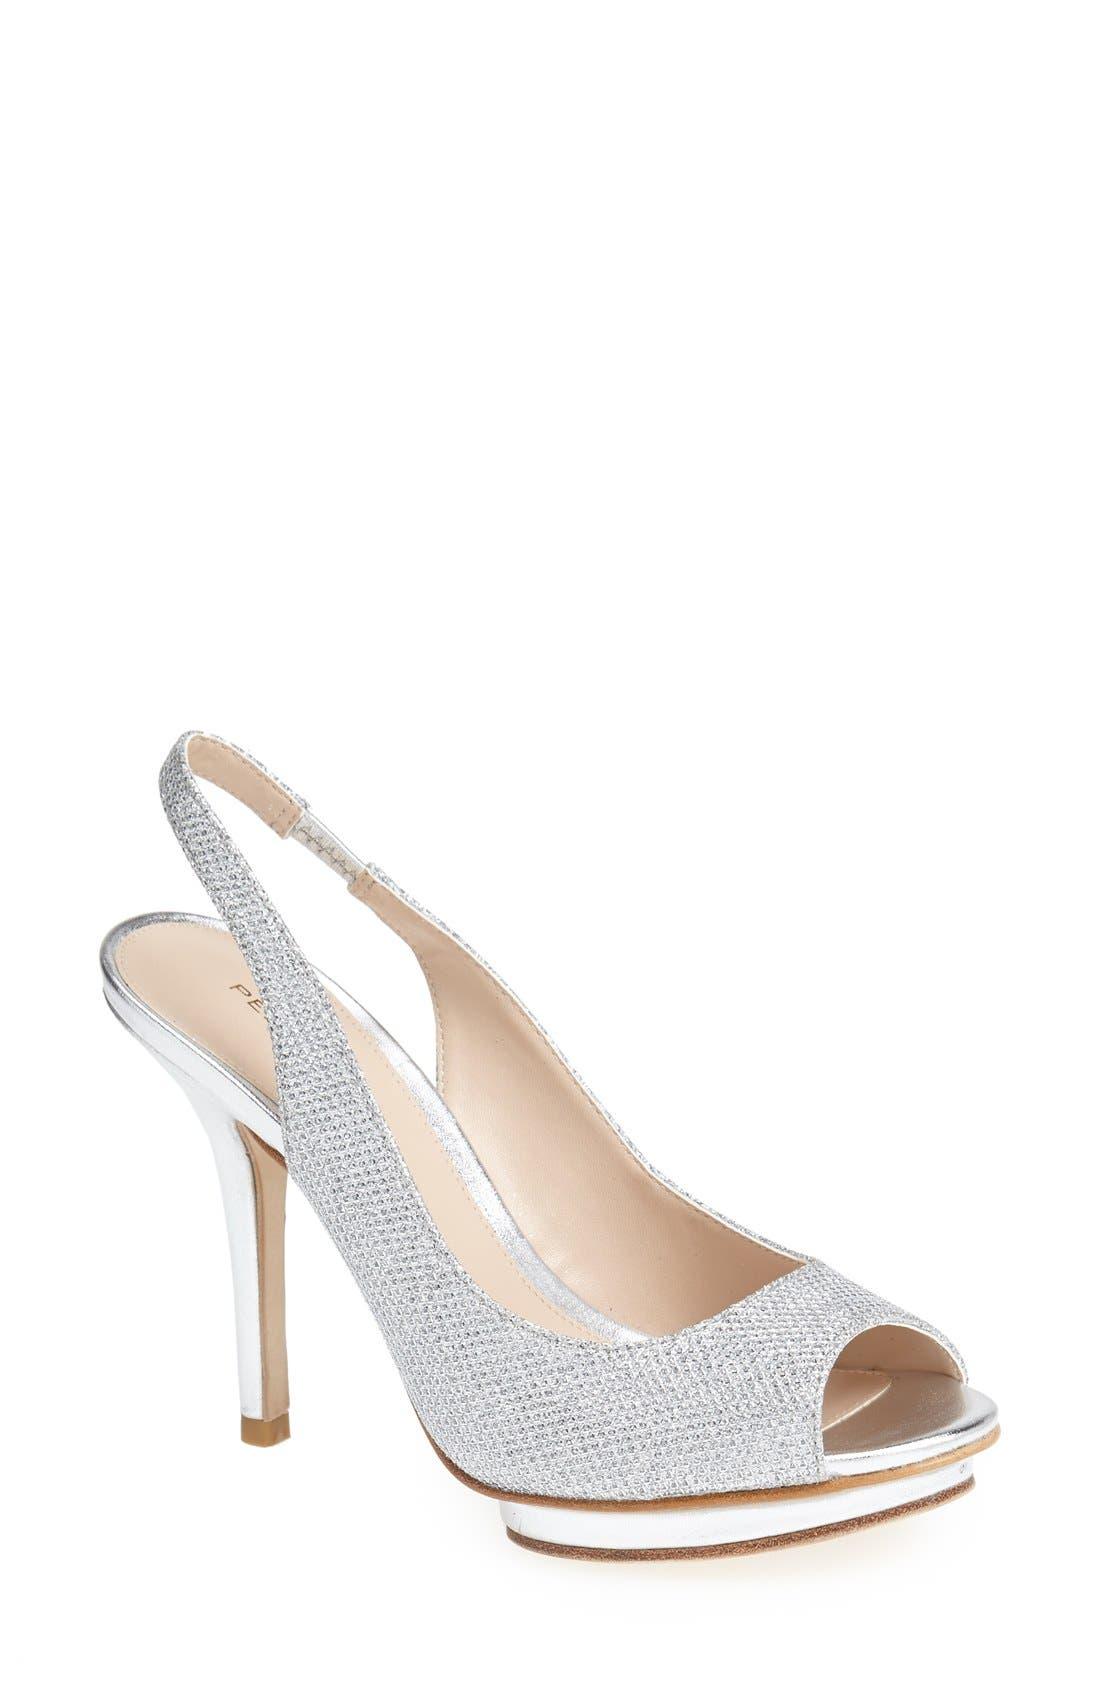 'Rivka' Open Toe Platform Slingback Sandal,                             Main thumbnail 1, color,                             Silver Metallic